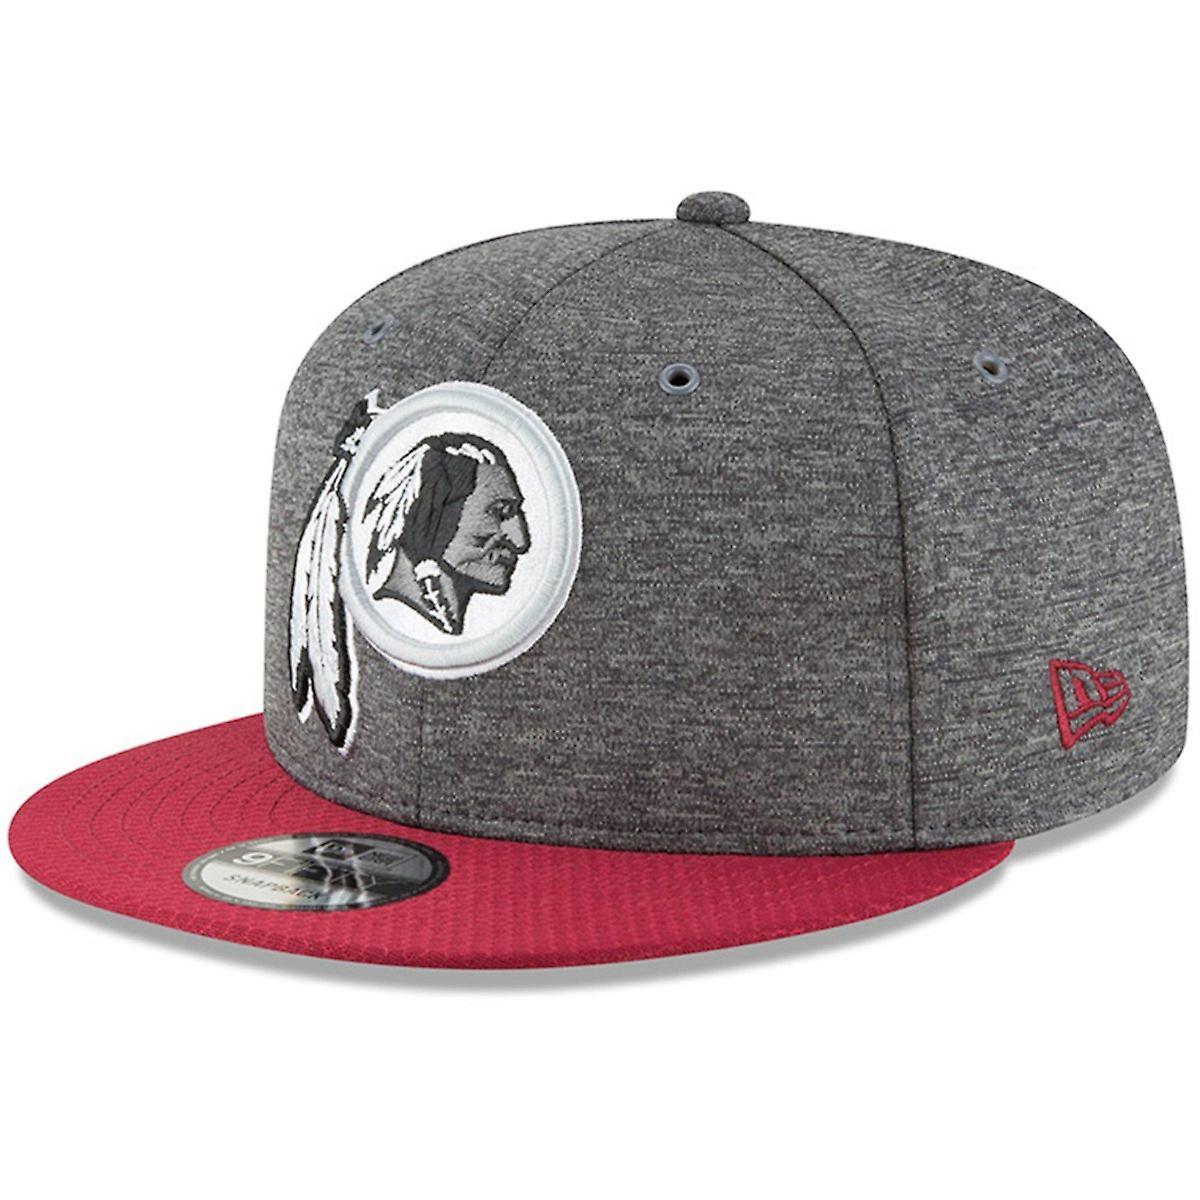 New Era Snapback Cap Sideline Home Washington Redskins Football Fanartikel